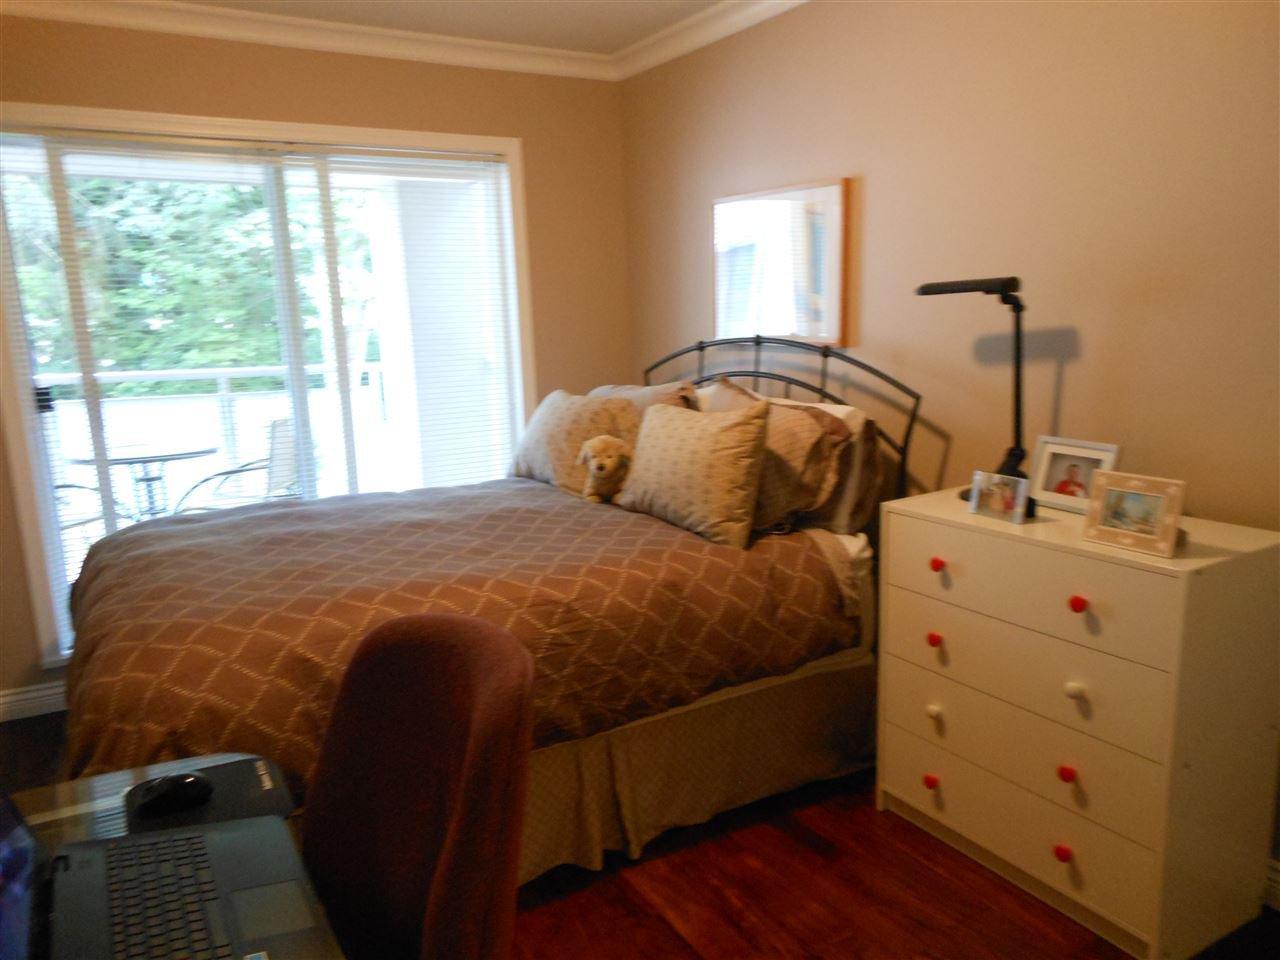 Photo 12: Photos: 206 15140 29A AVENUE in Surrey: King George Corridor Condo for sale (South Surrey White Rock)  : MLS®# R2089187